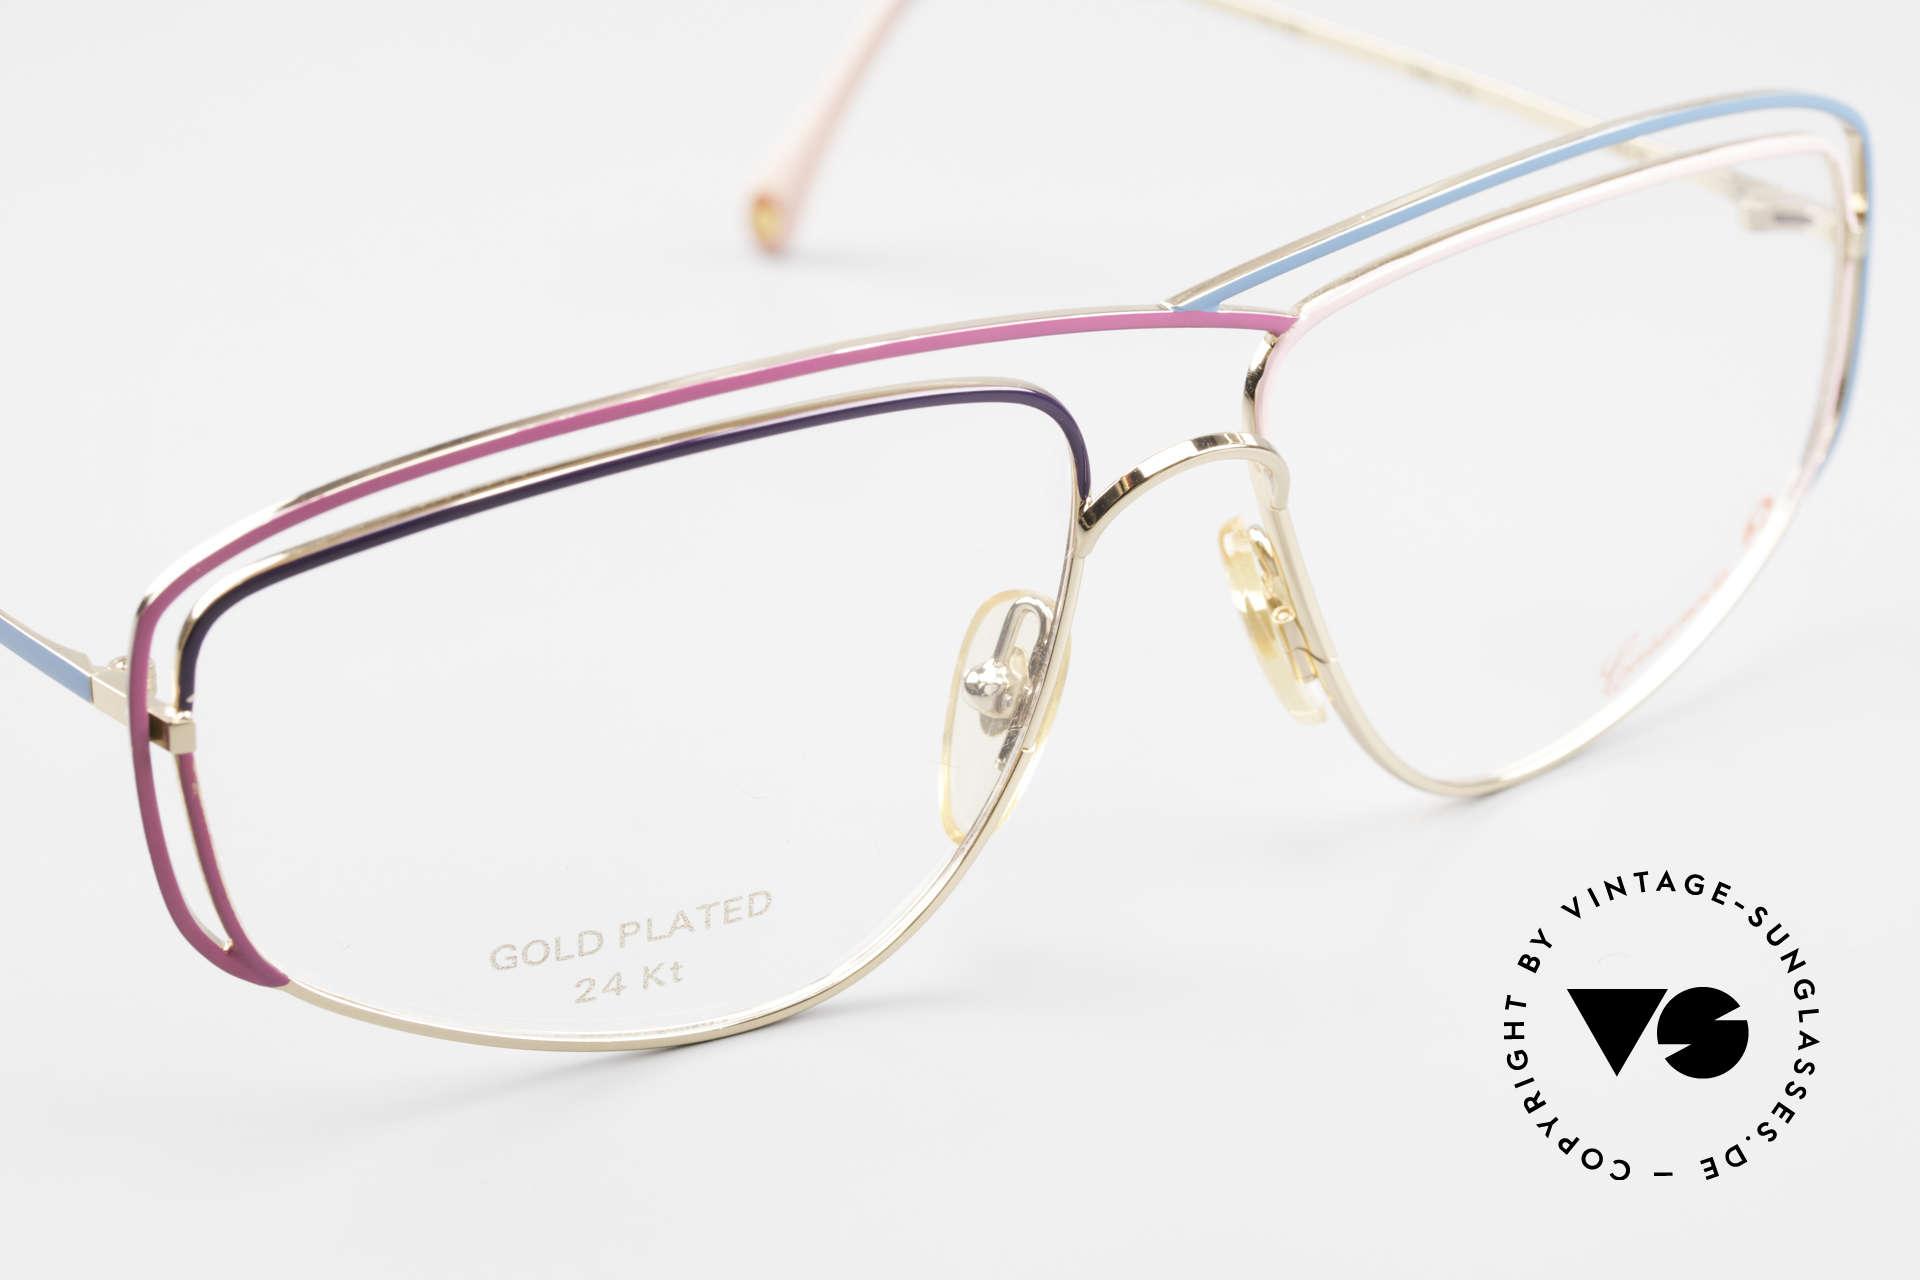 Casanova CN24 24kt Gold Plated Ladies Frame, NOS - unworn (like all our artistic vintage 80's eyewear), Made for Women